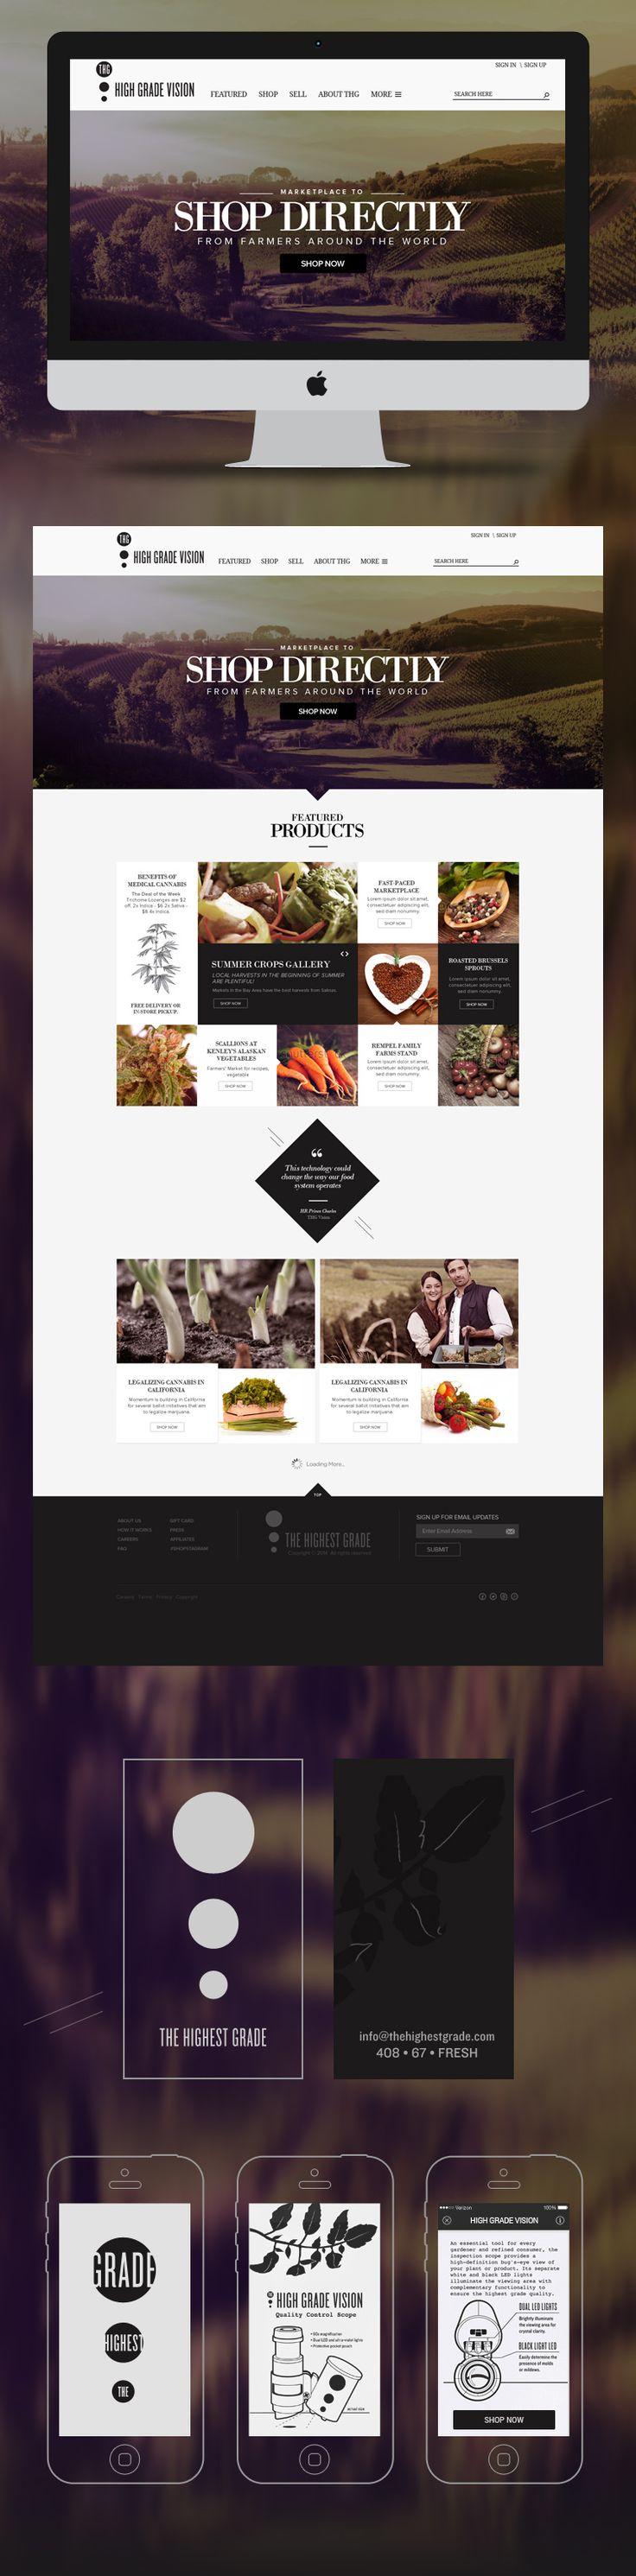 THG: Website Design by Naresh Kumar